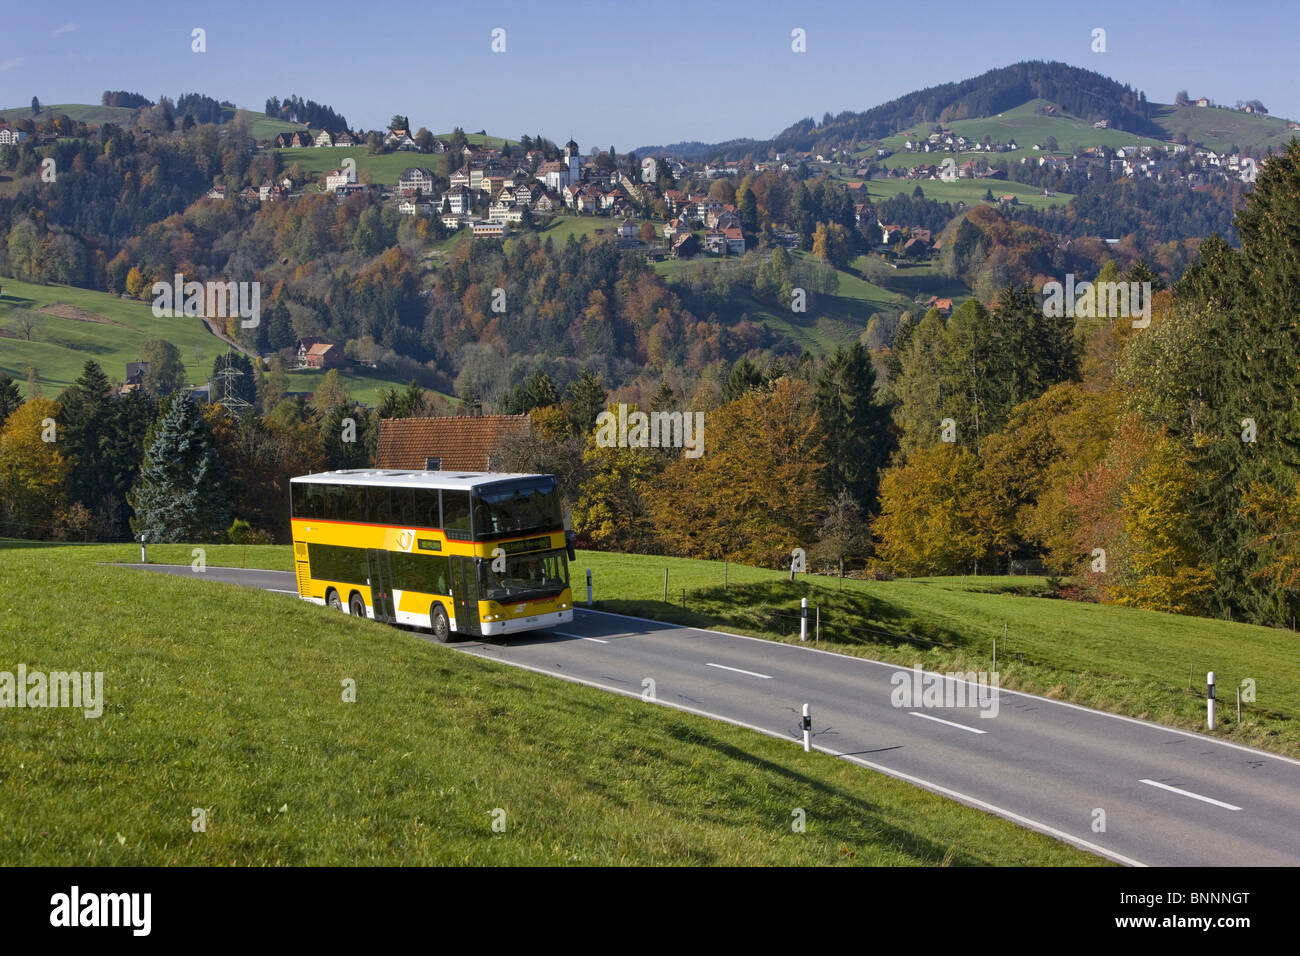 Deceived postal car autumn tree trees scenery canton Appenzell Ausserrhoden Appenzellerland postal car Switzerland - Stock Image